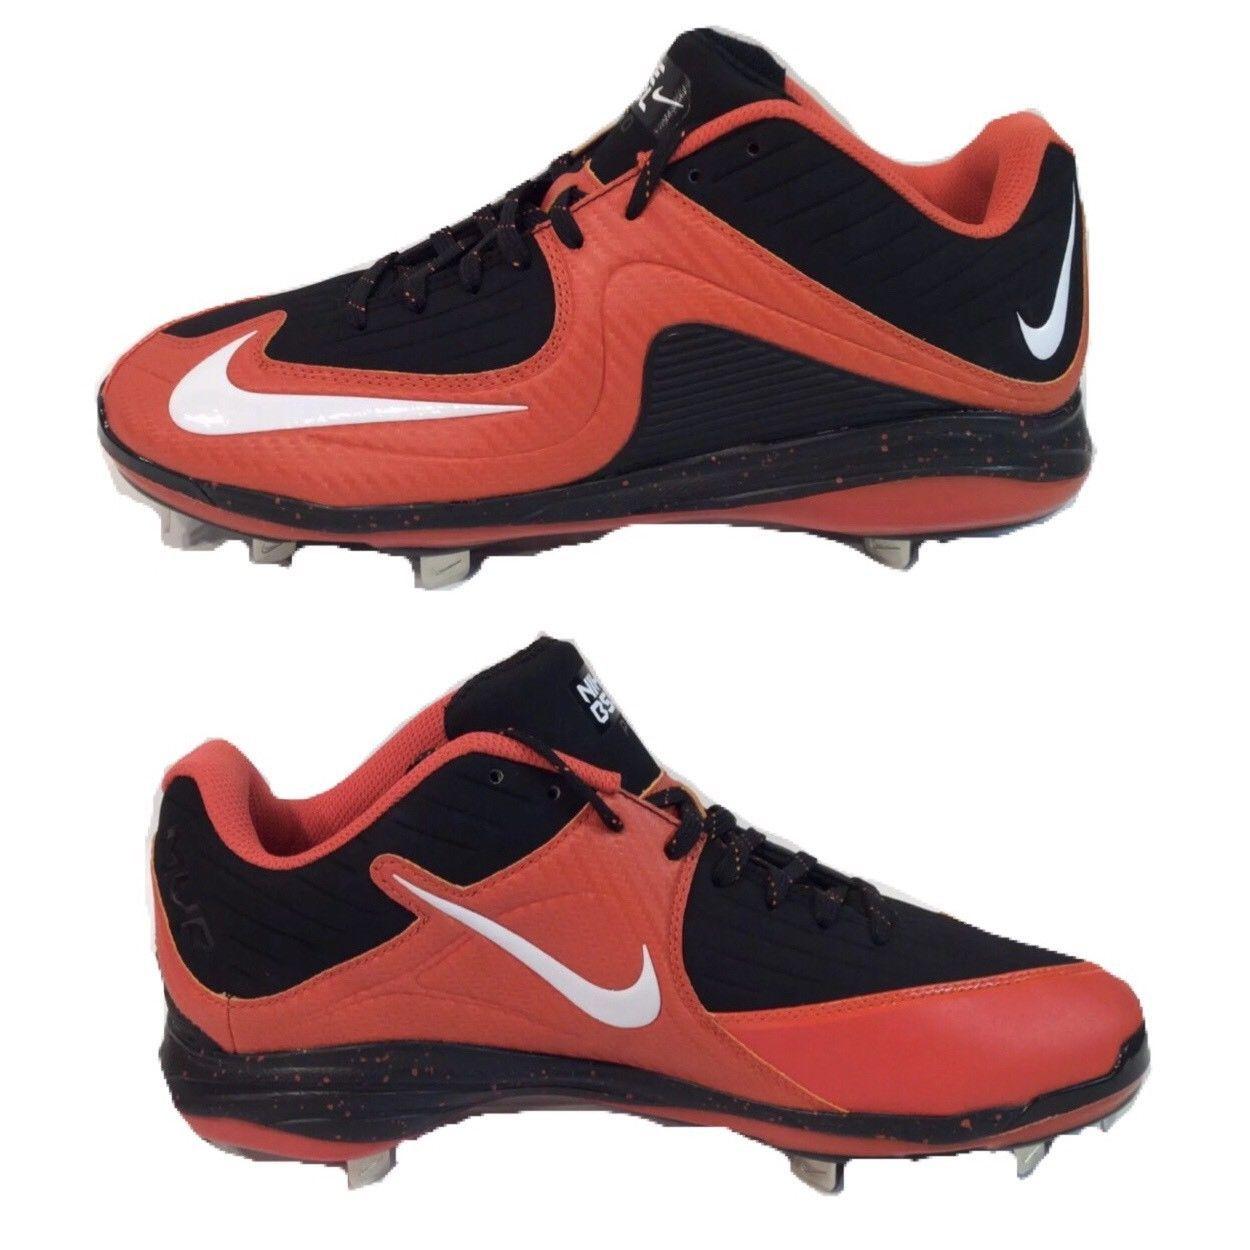 4b24fc005a2 Nike 684685-018 (13) MVP Pro Metal II and 50 similar items